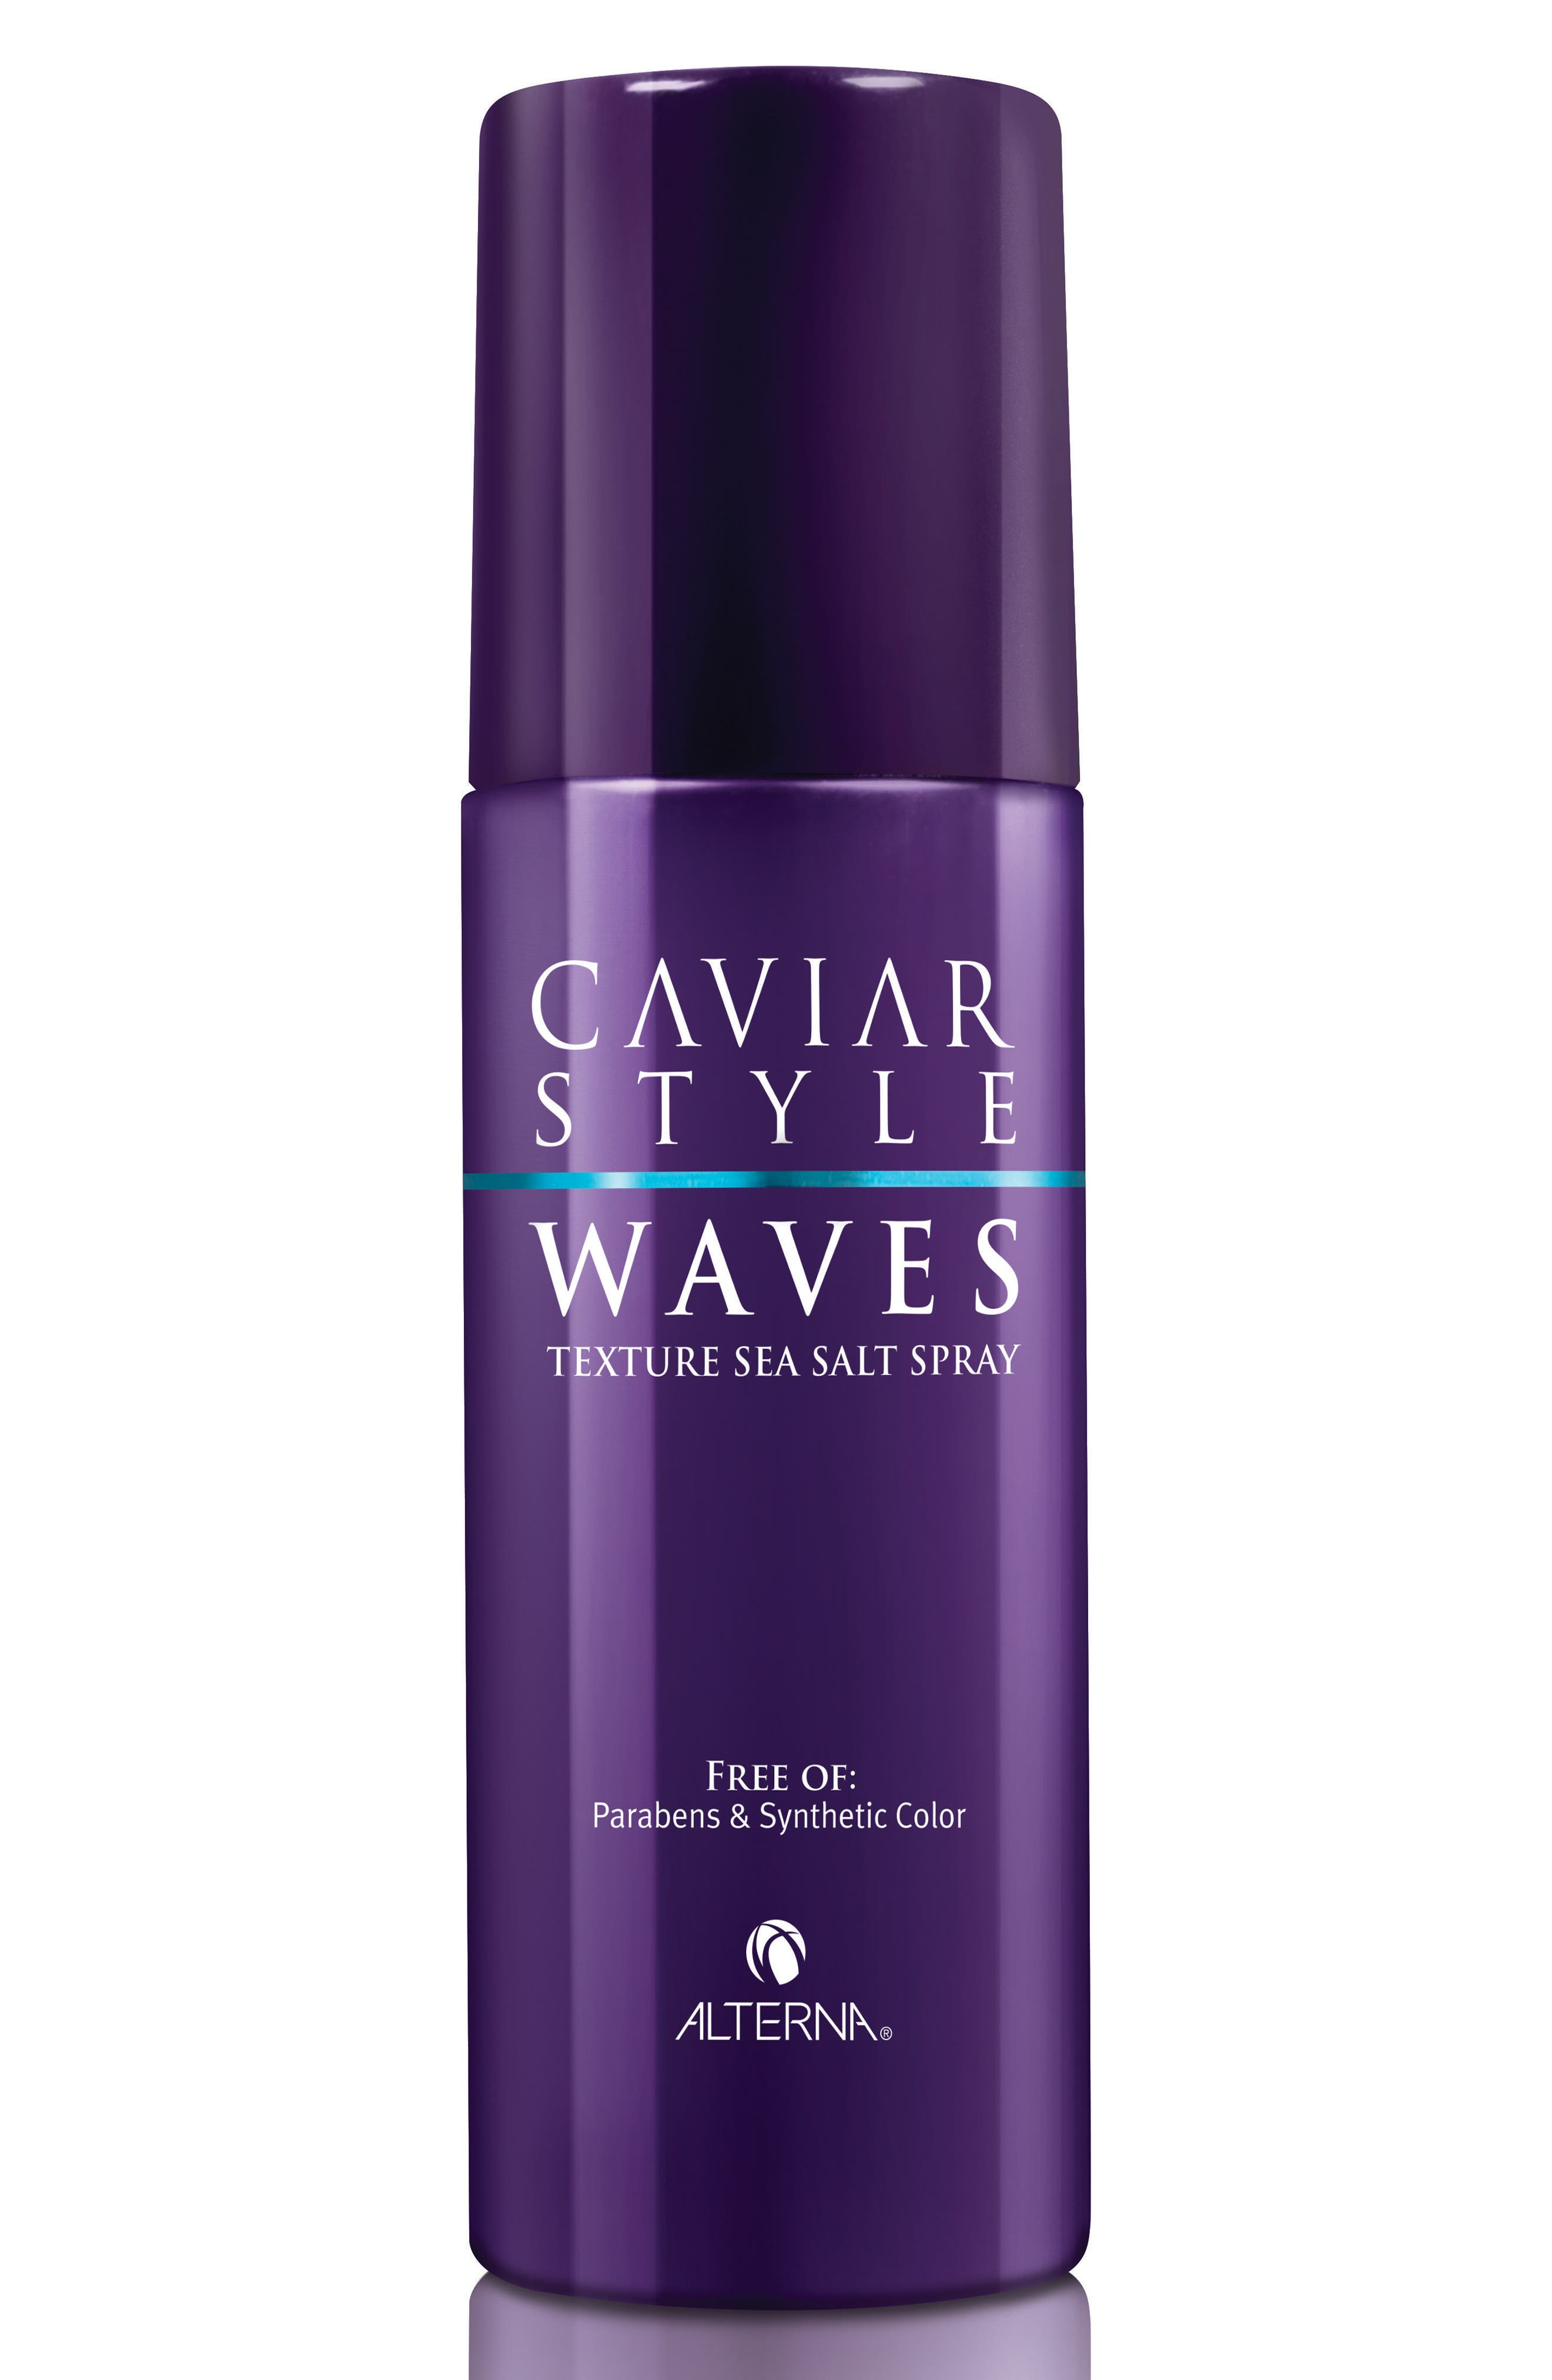 Caviar Style Waves Texture Sea Salt Spray,                             Main thumbnail 1, color,                             No Color